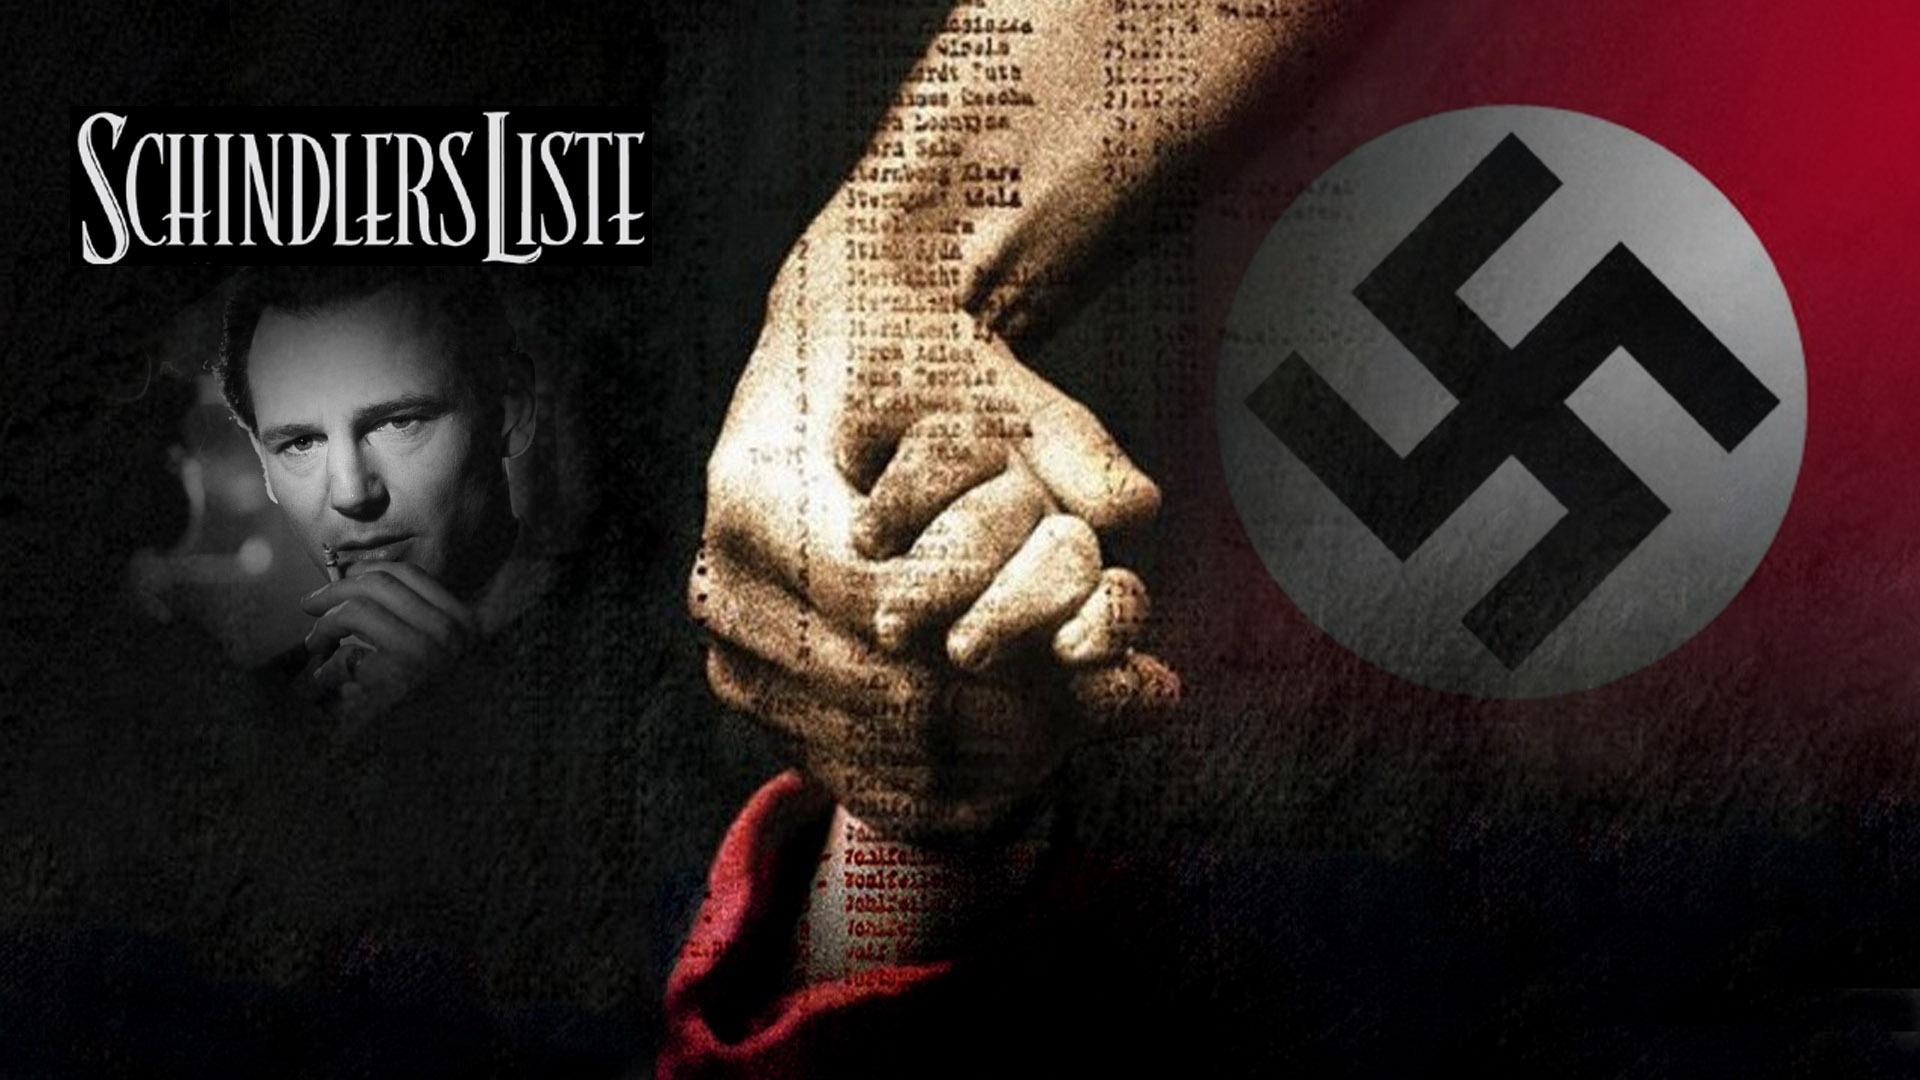 Steven Spielberg's Schindlers List